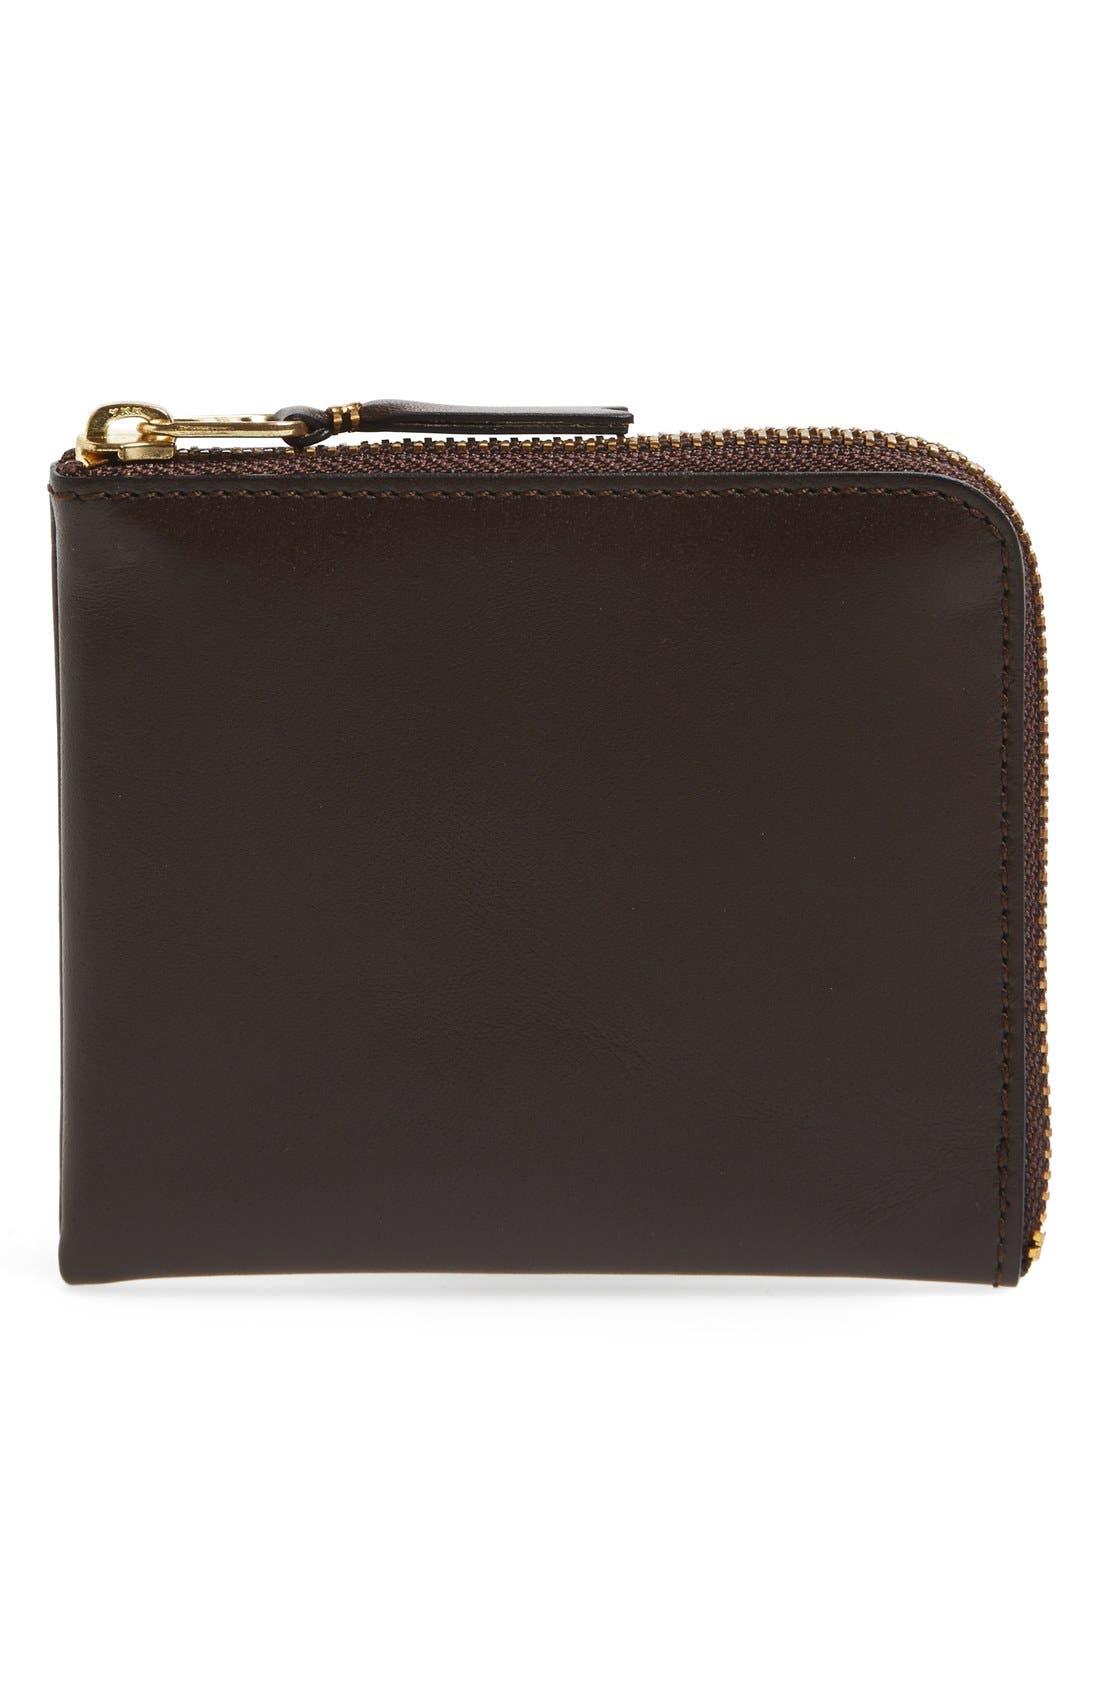 Alternate Image 1 Selected - Comme des Garçons Half-Zip Leather Wallet